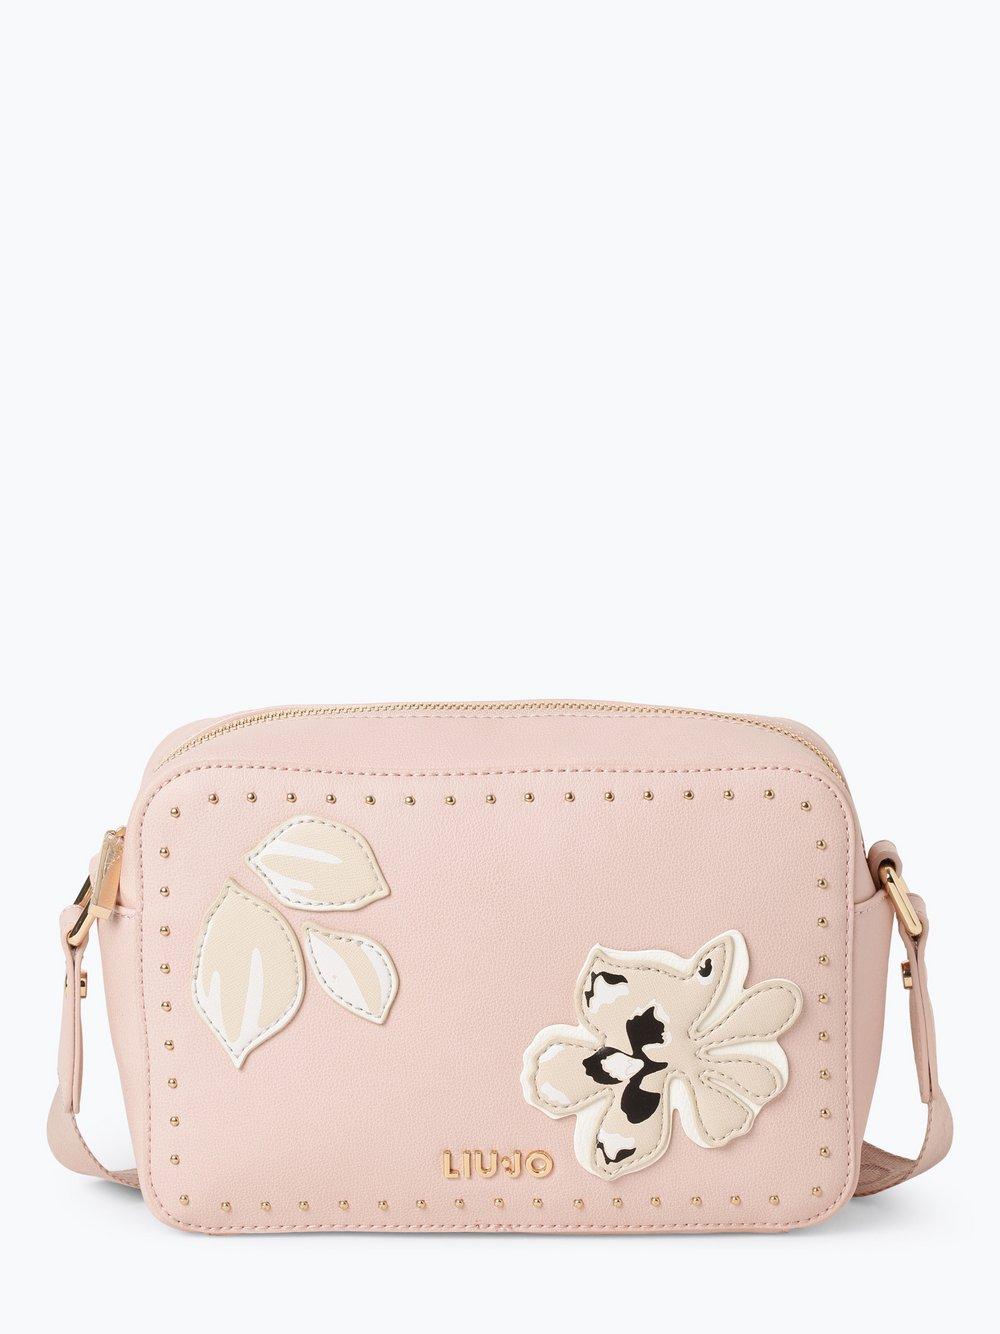 Damska torebka na ramię Guess Torebki damskie różowe w van Graaf